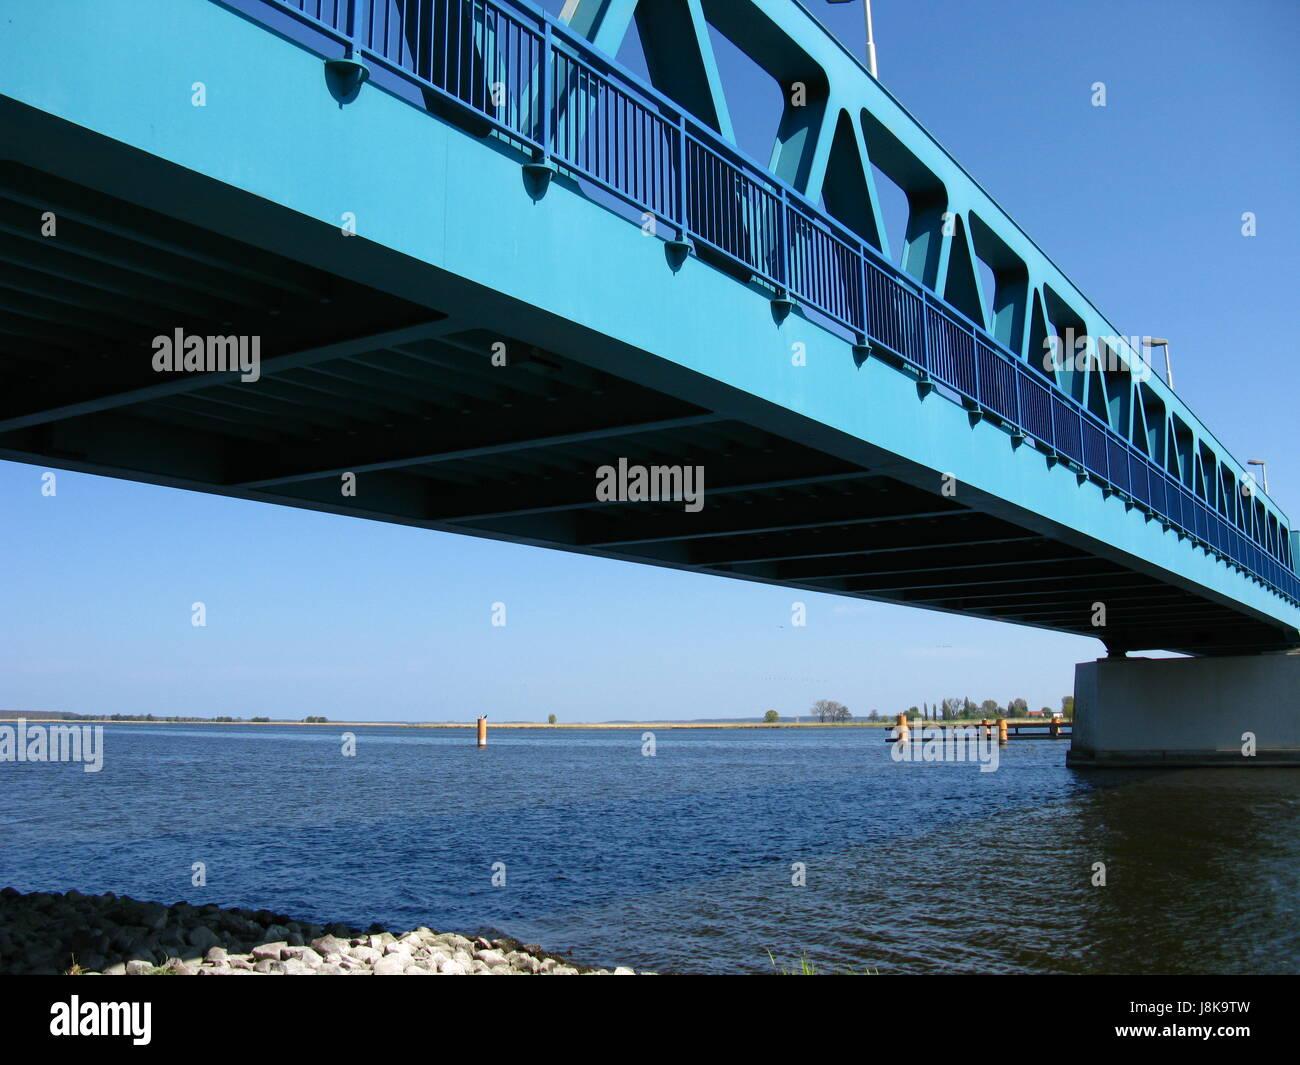 bridge, traffic, transportation, road traffic, connection, connectivity, Stock Photo